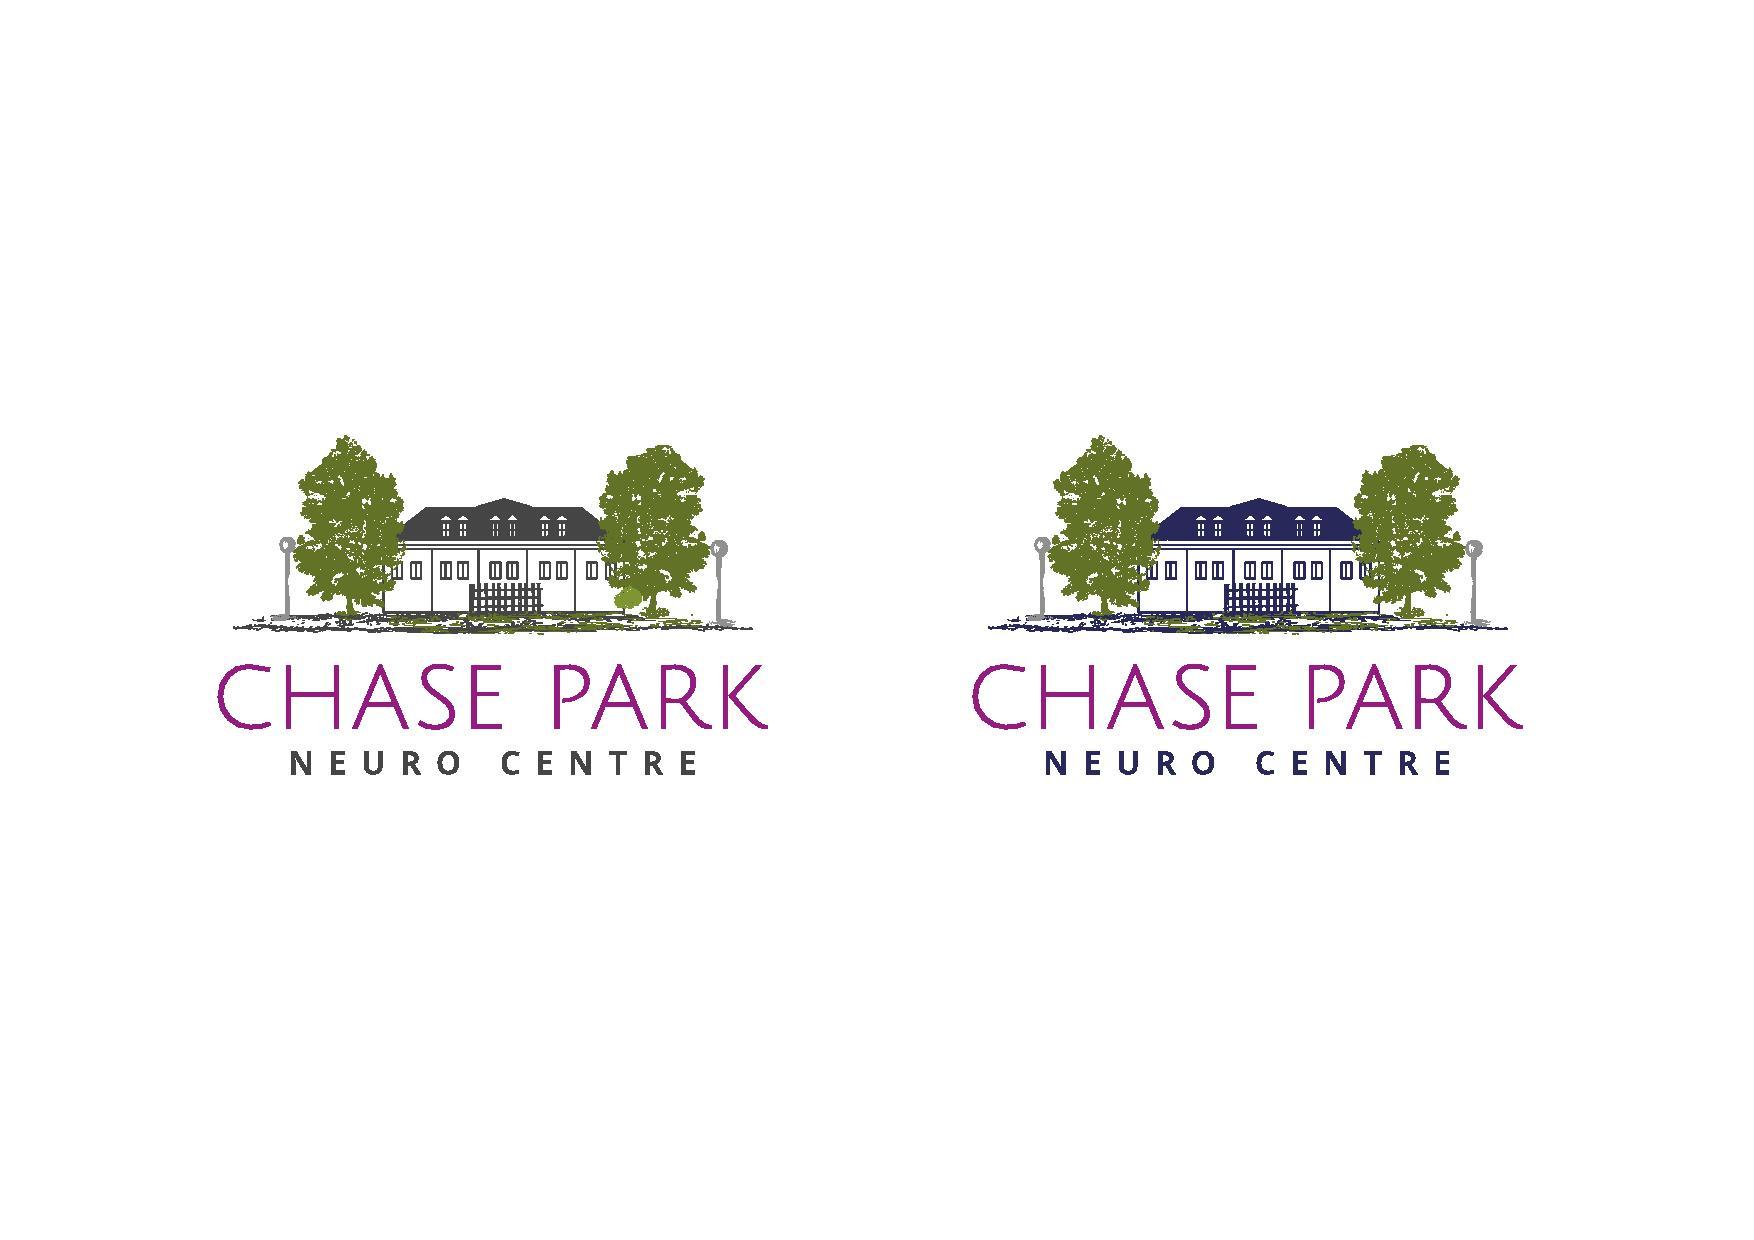 Chase Park Neuro Centre